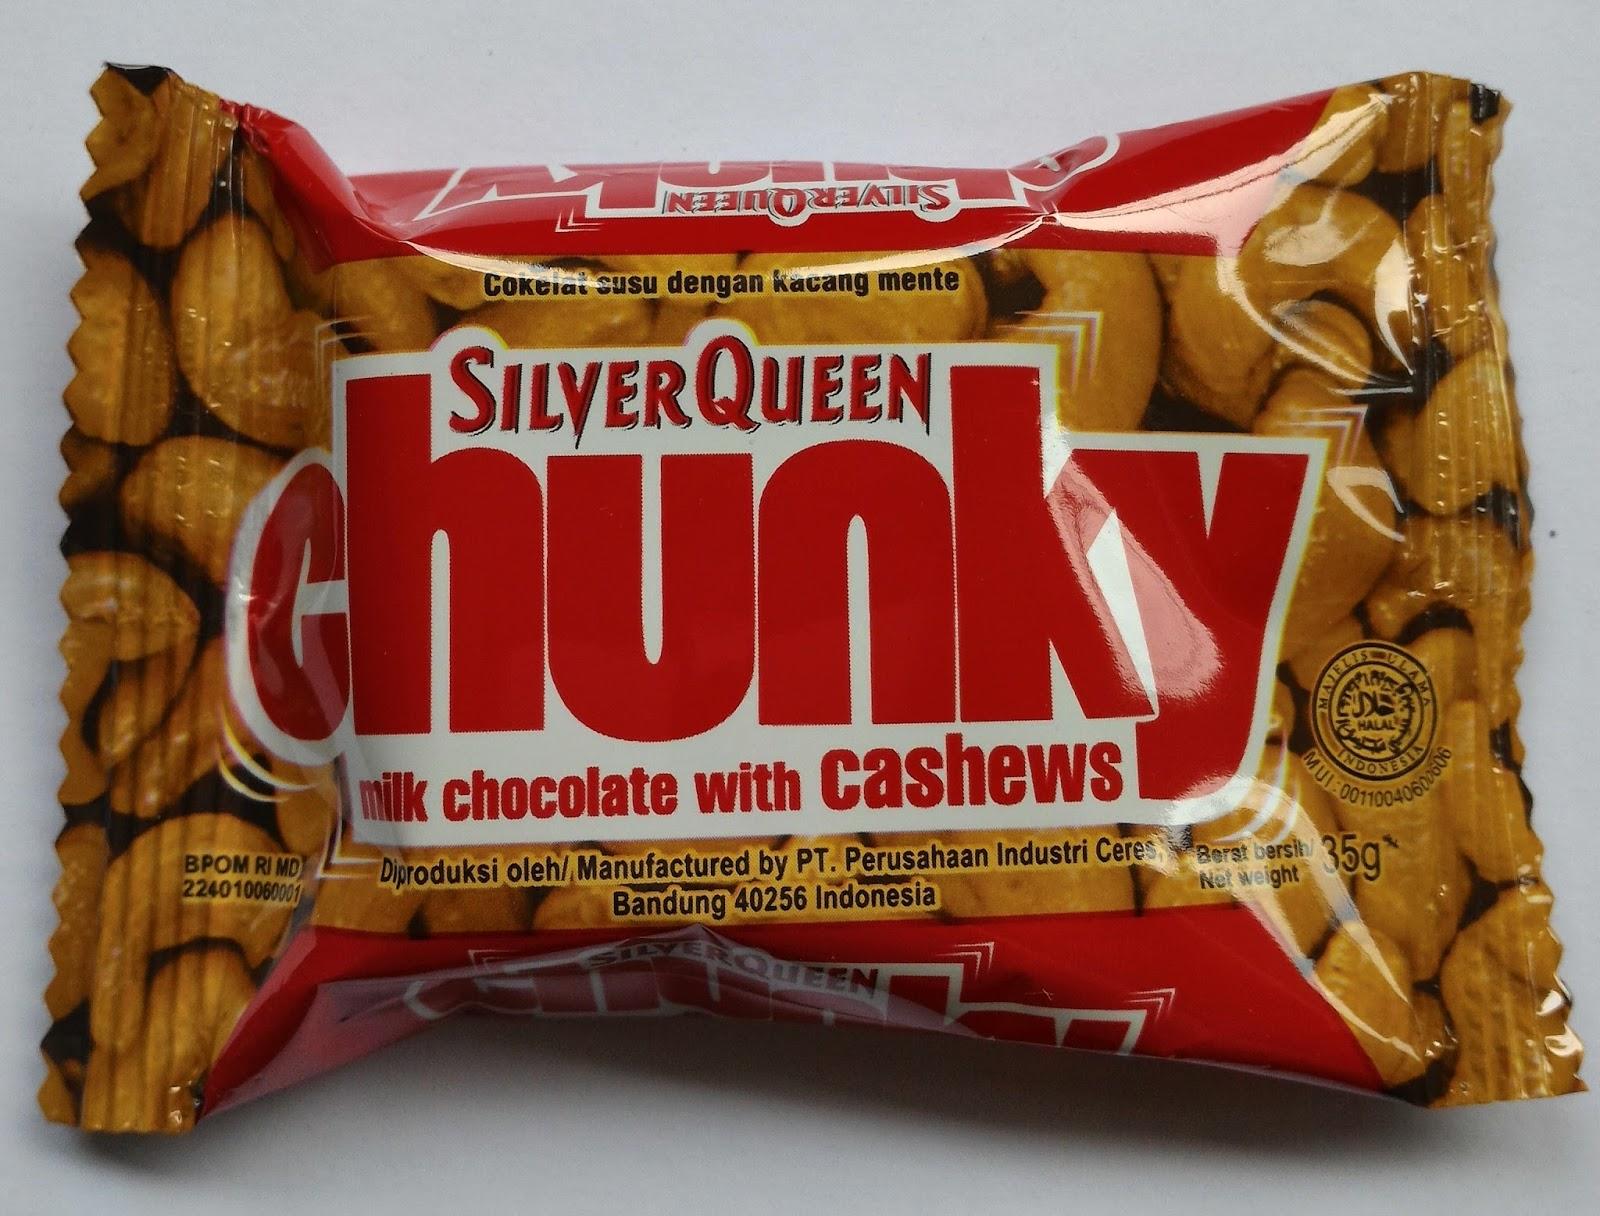 Coklat Delfi Kiloan Catalog Silverqueen Sq Chunky Bar White 100 Gr Cashew 35gr